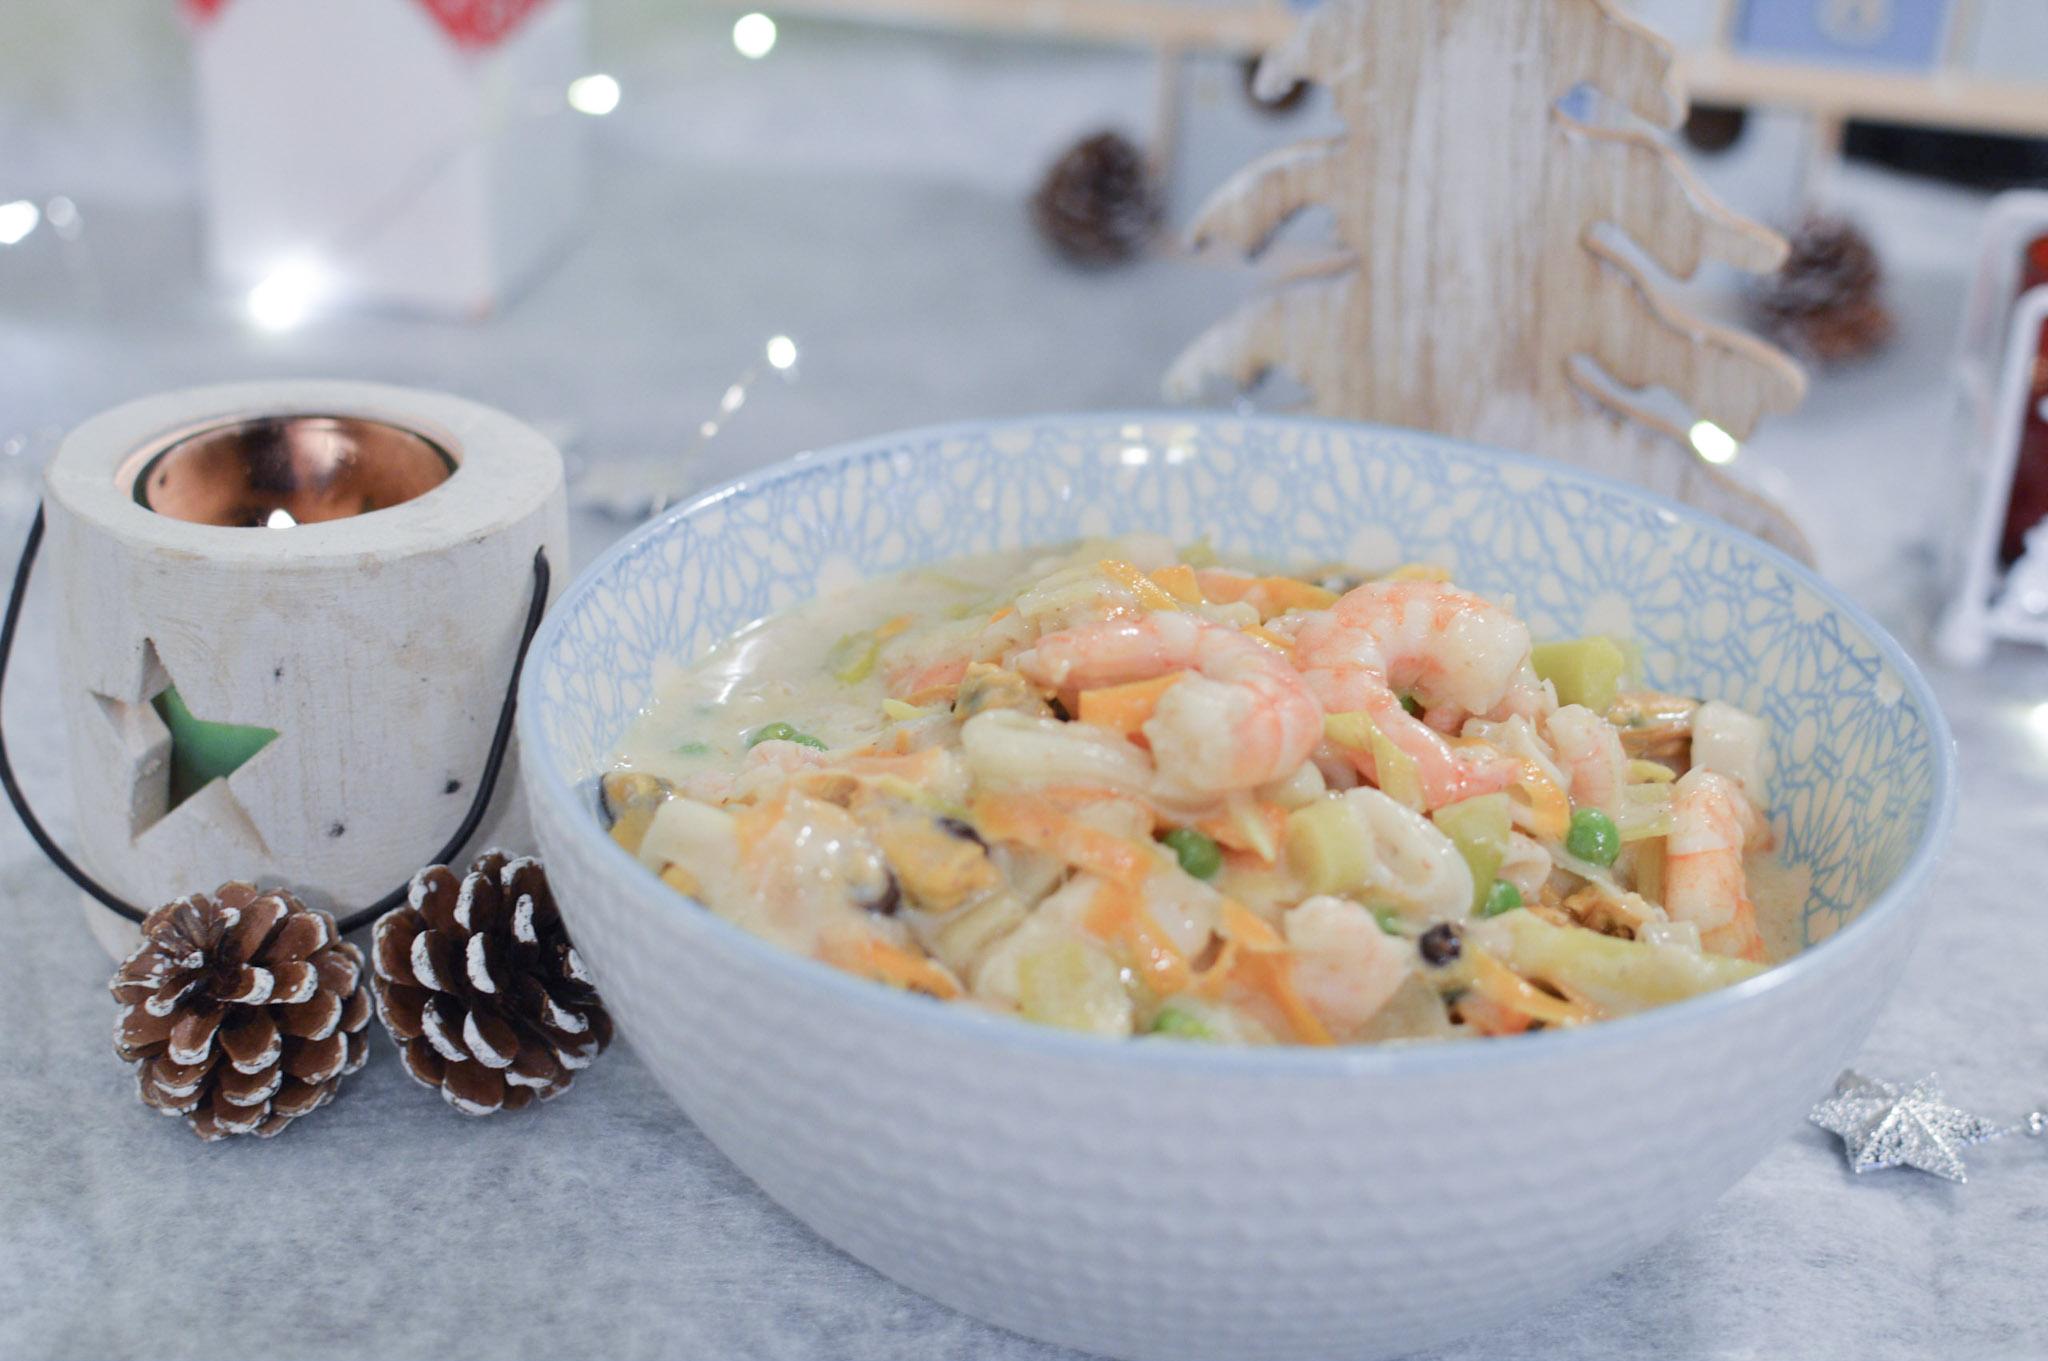 Marmite de fruits de mer aux petits légumes - Repas festif IG Bas - Bienvenue chez vero